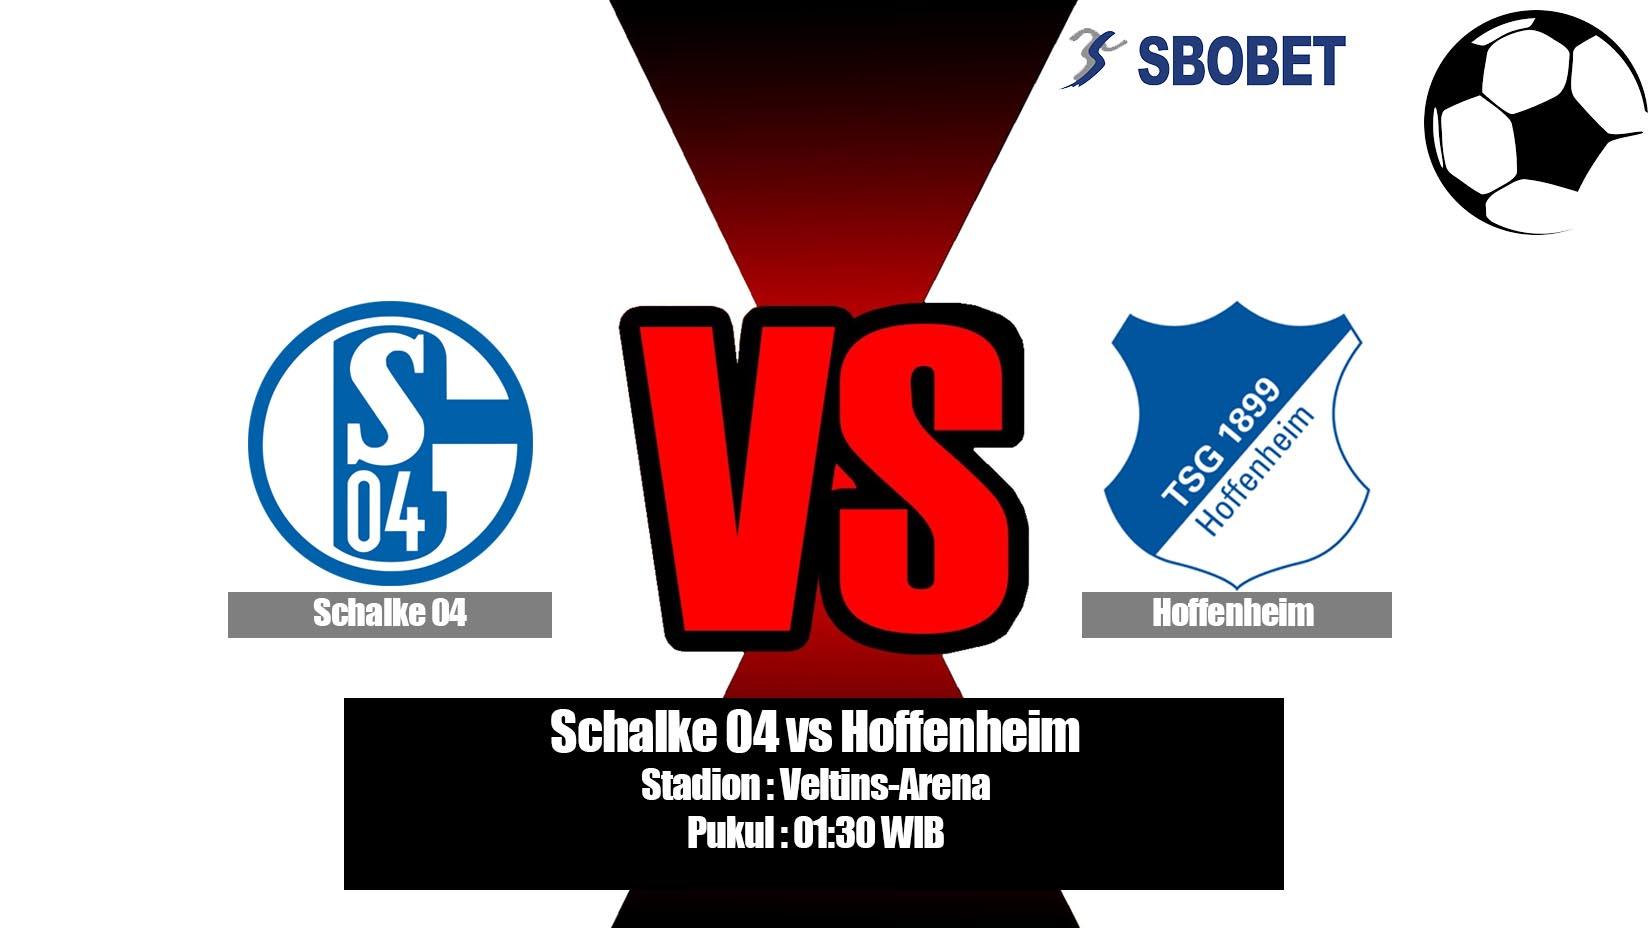 Prediksi Bola Schalke 04 vs Hoffenheim 21 April 2019